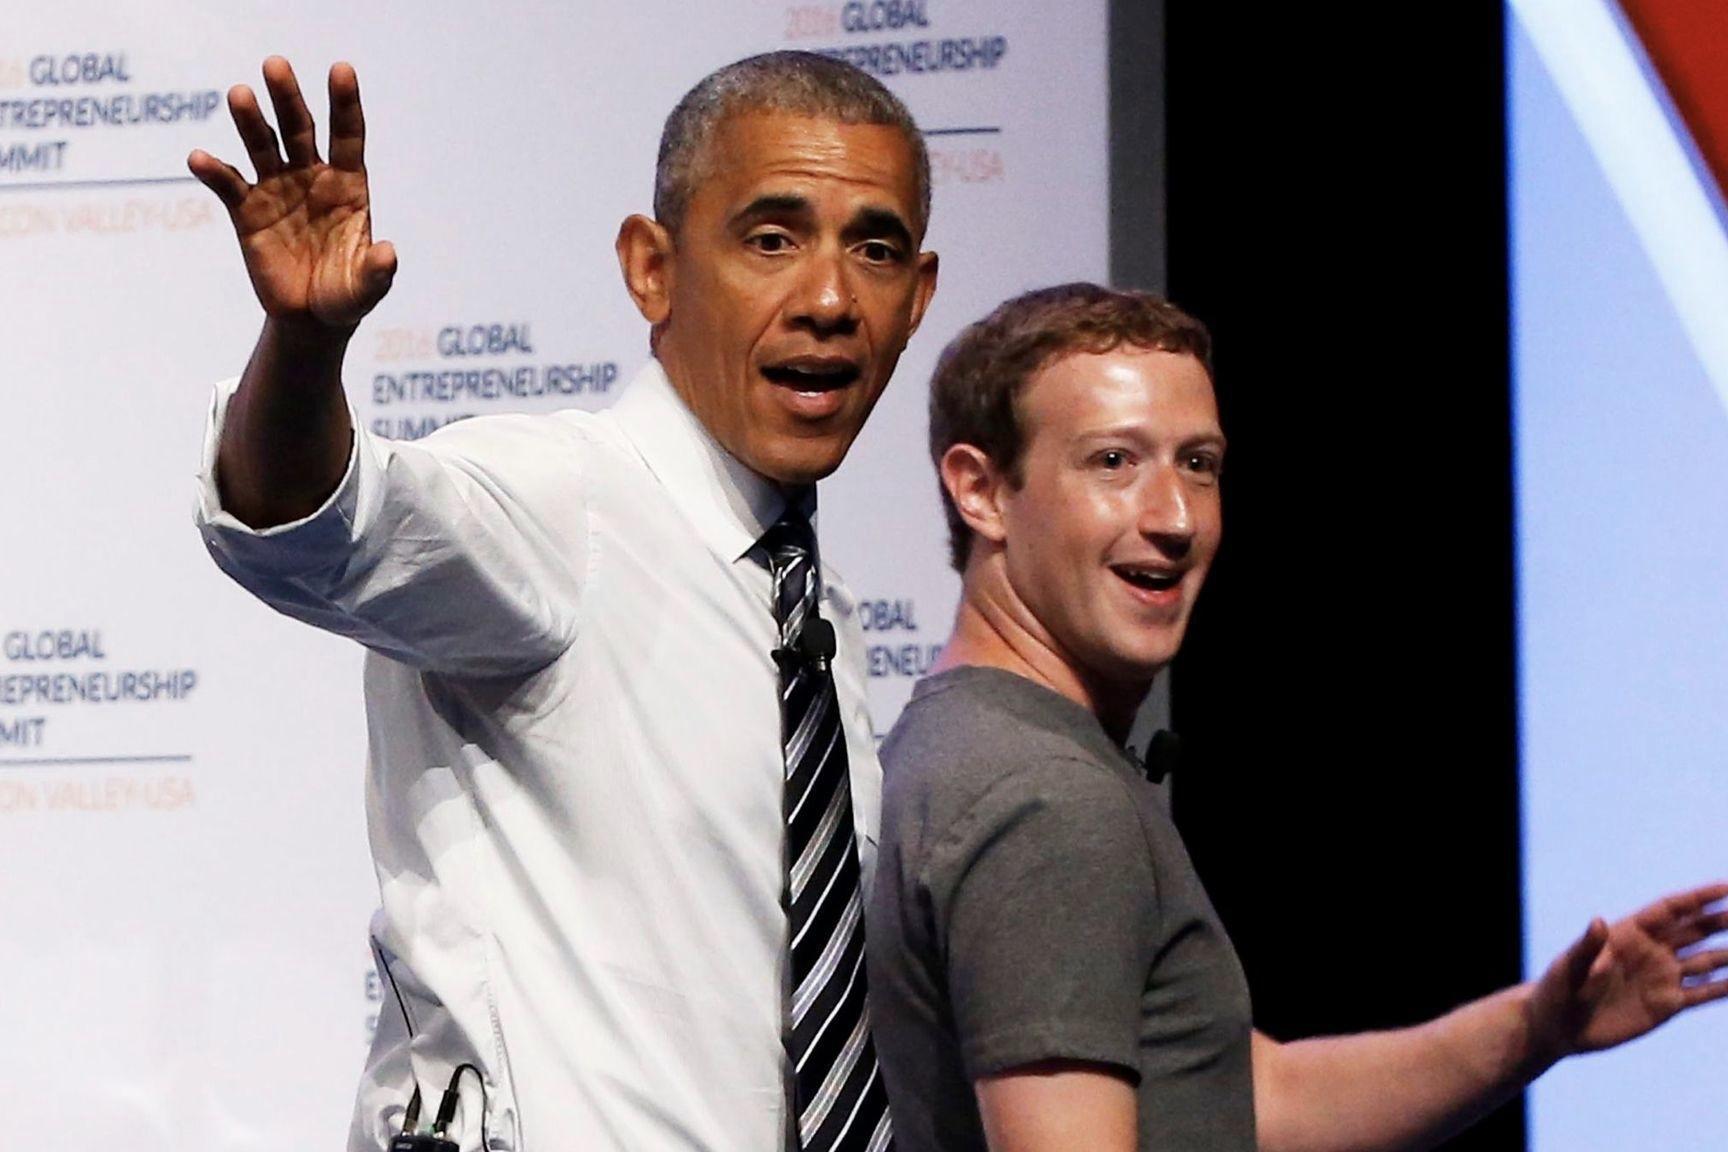 Obama Warned Mark Zuckerberg About Facebook